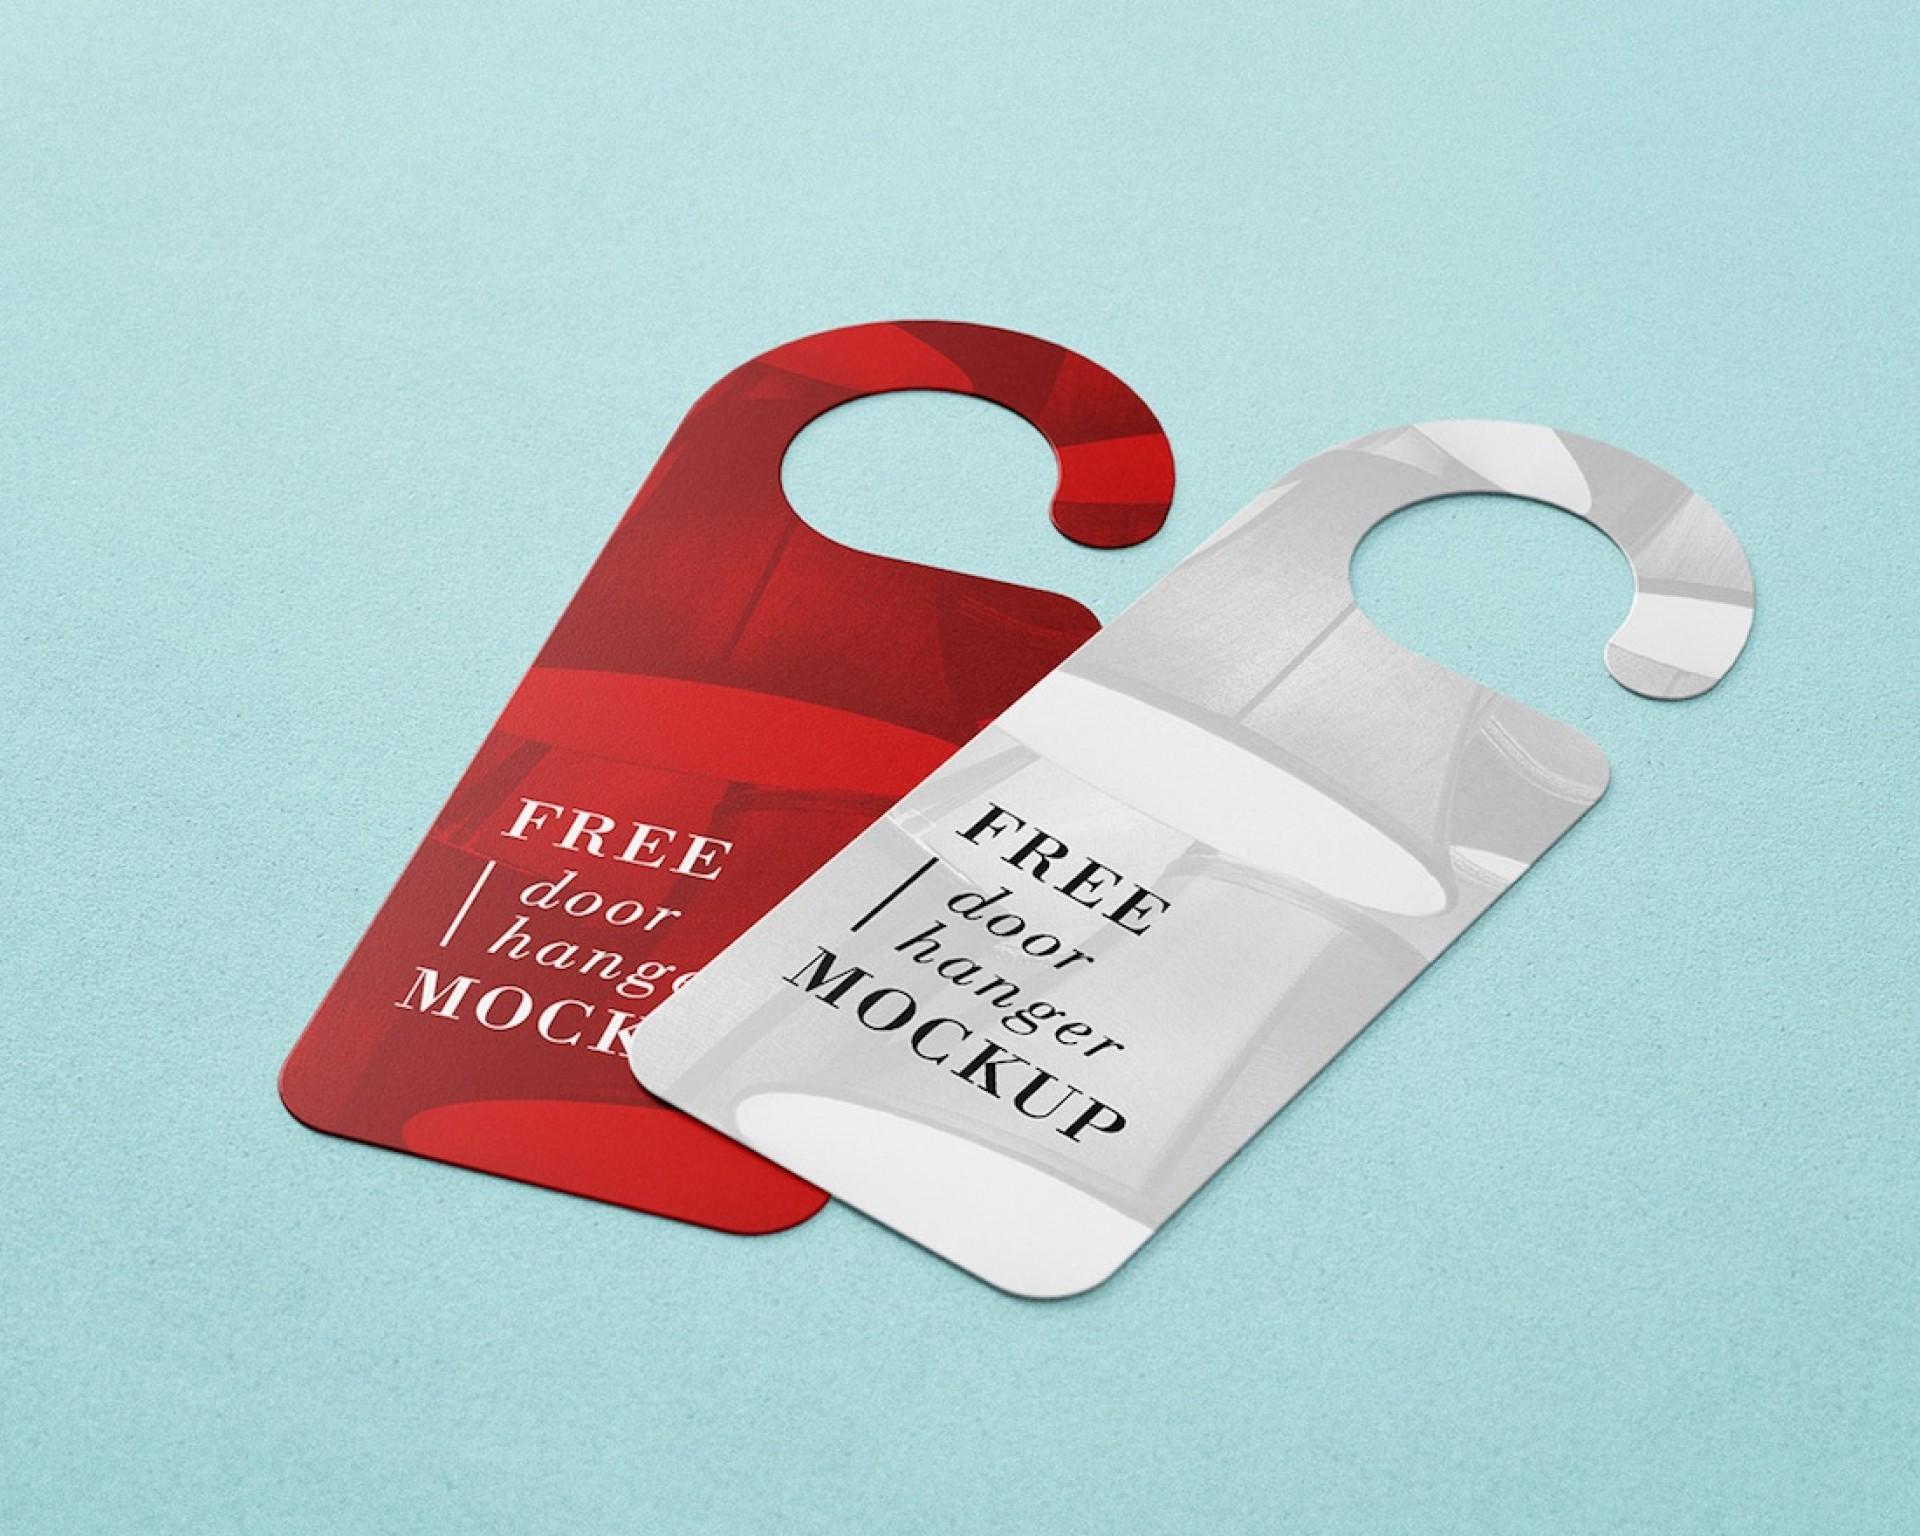 006 Wonderful Door Hanger Template For Word Image  Download Free Wedding Microsoft1920